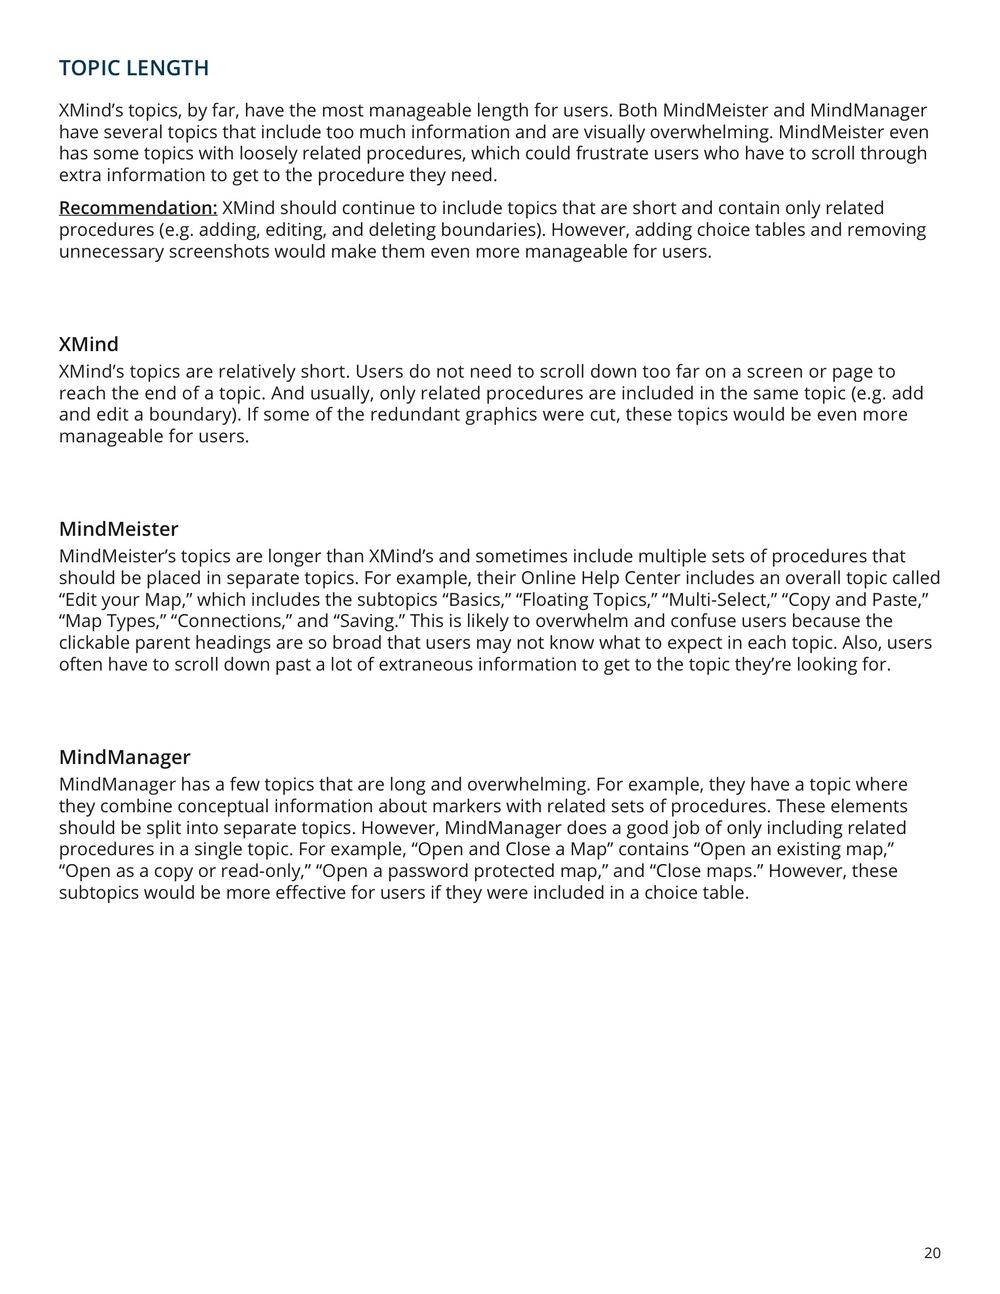 XMind Final Report_4-23-15 20-20.jpeg